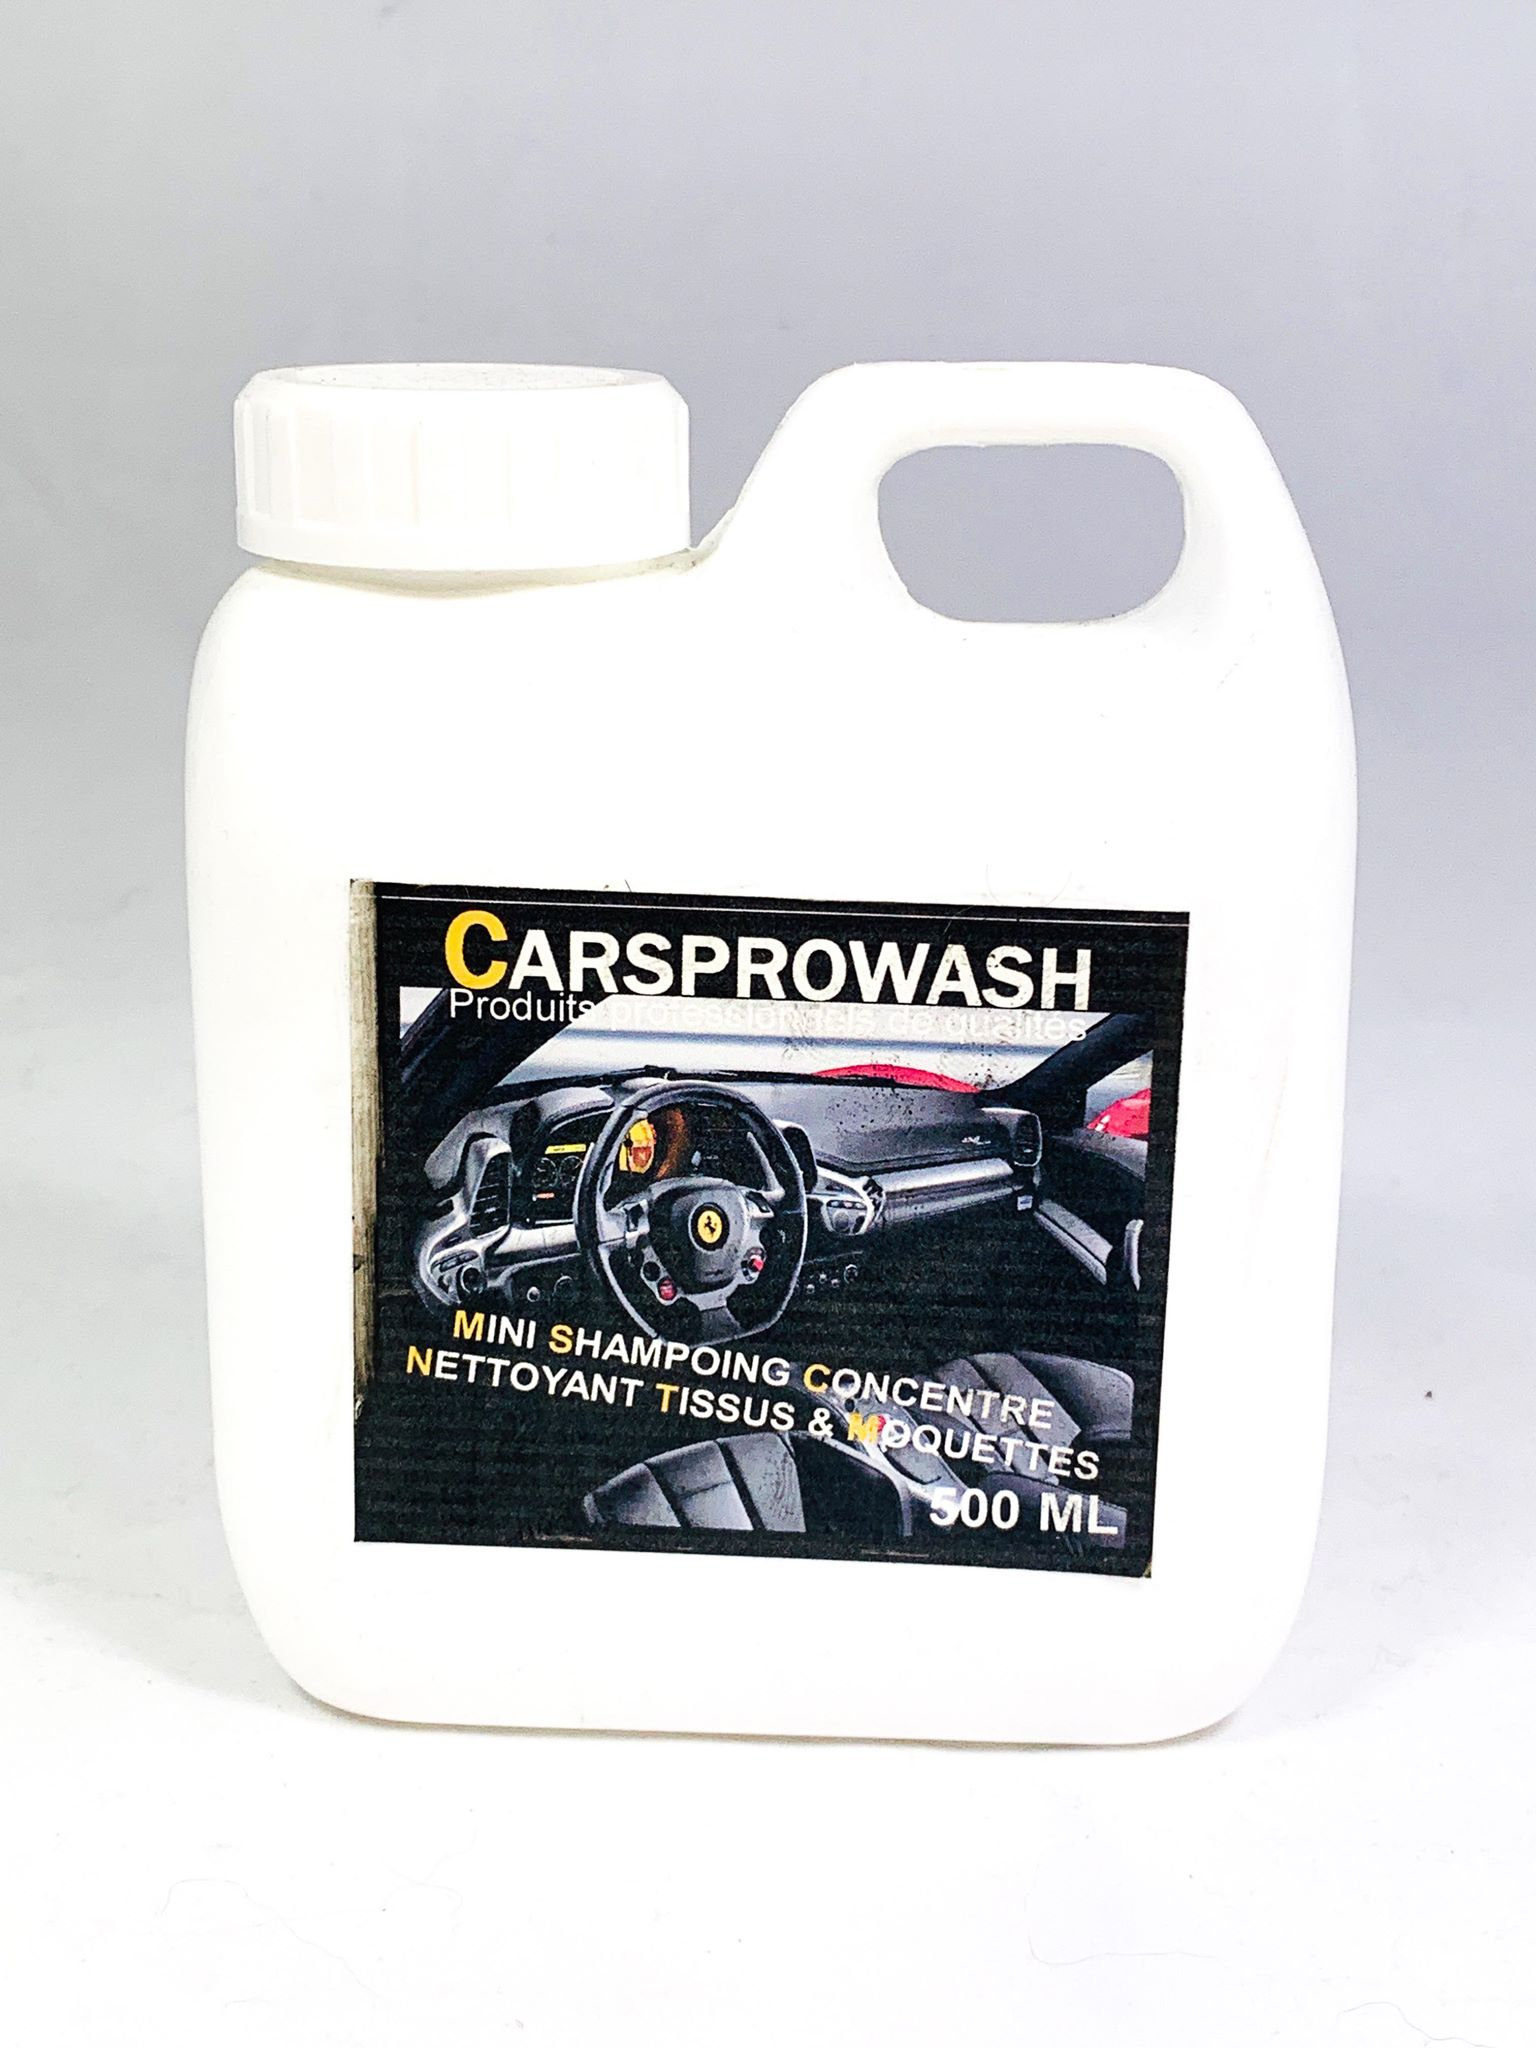 Tissus St Medard En Jalles mini shampoing concentre nettoyant tissus & moquettes 500 ml | carsprowash